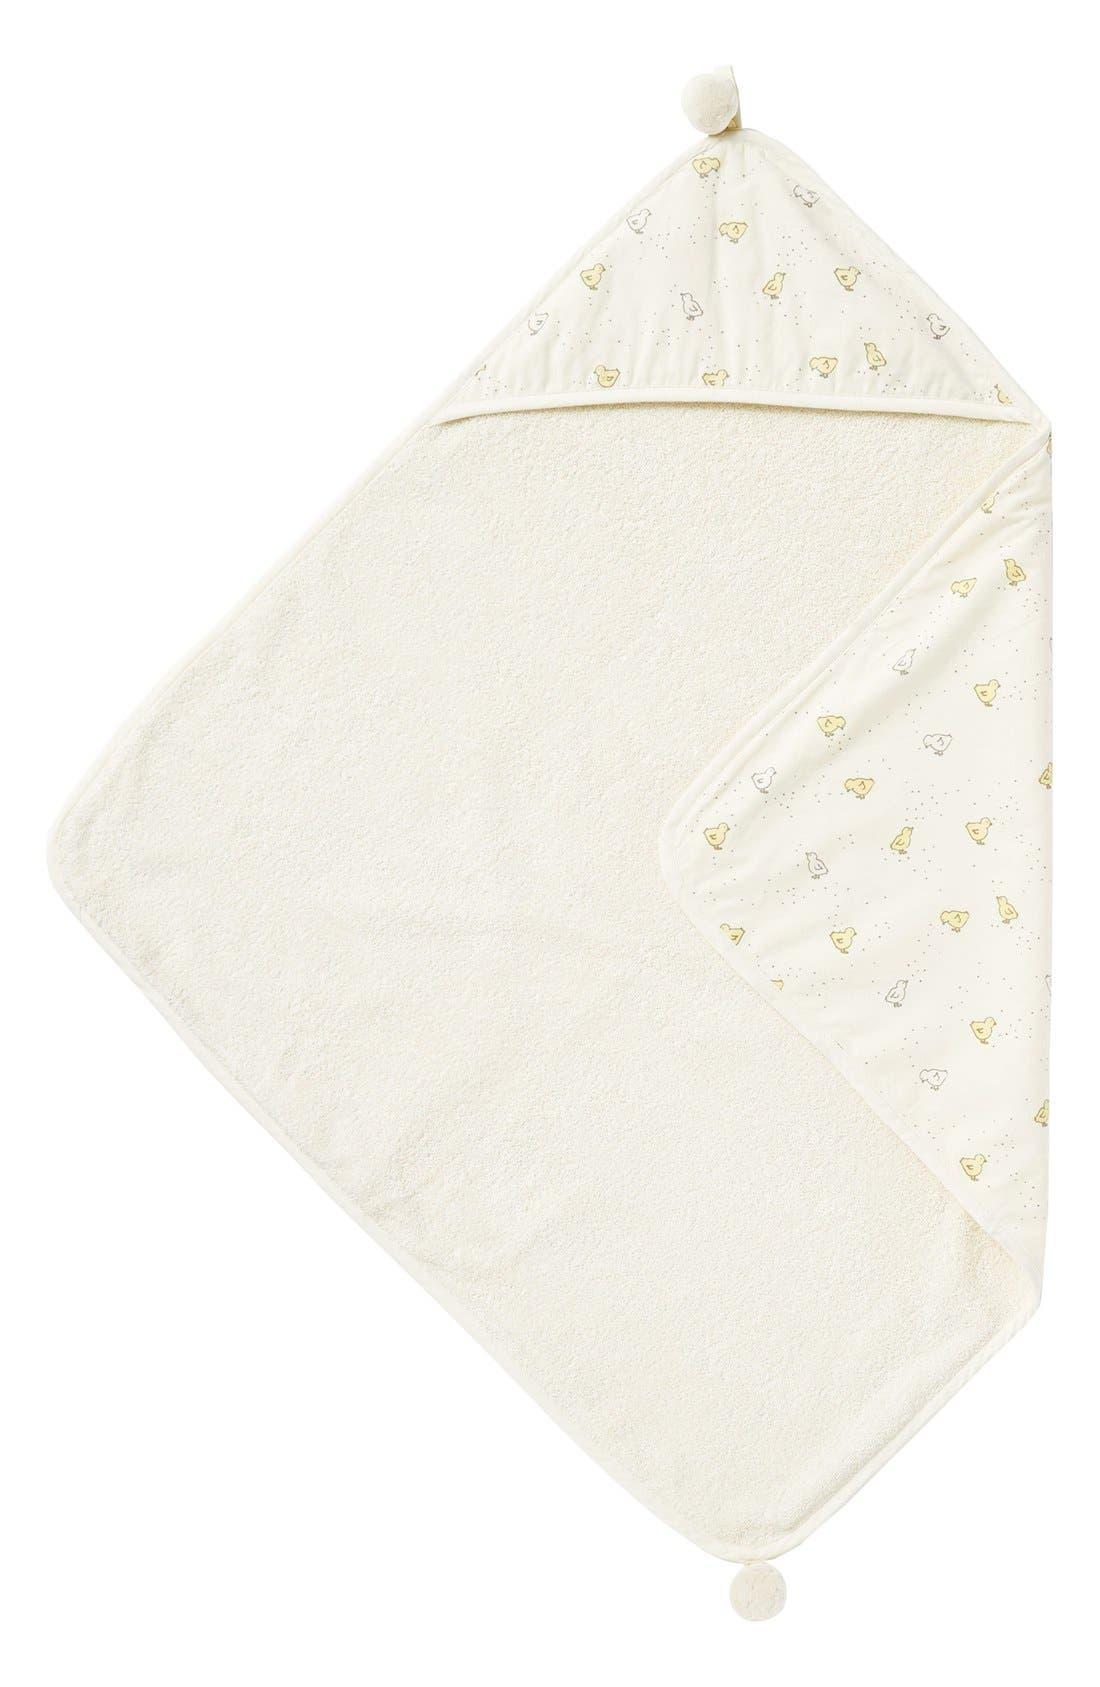 Main Image - Petit Pehr 'Baby Chick' Print Hooded Towel (Baby)